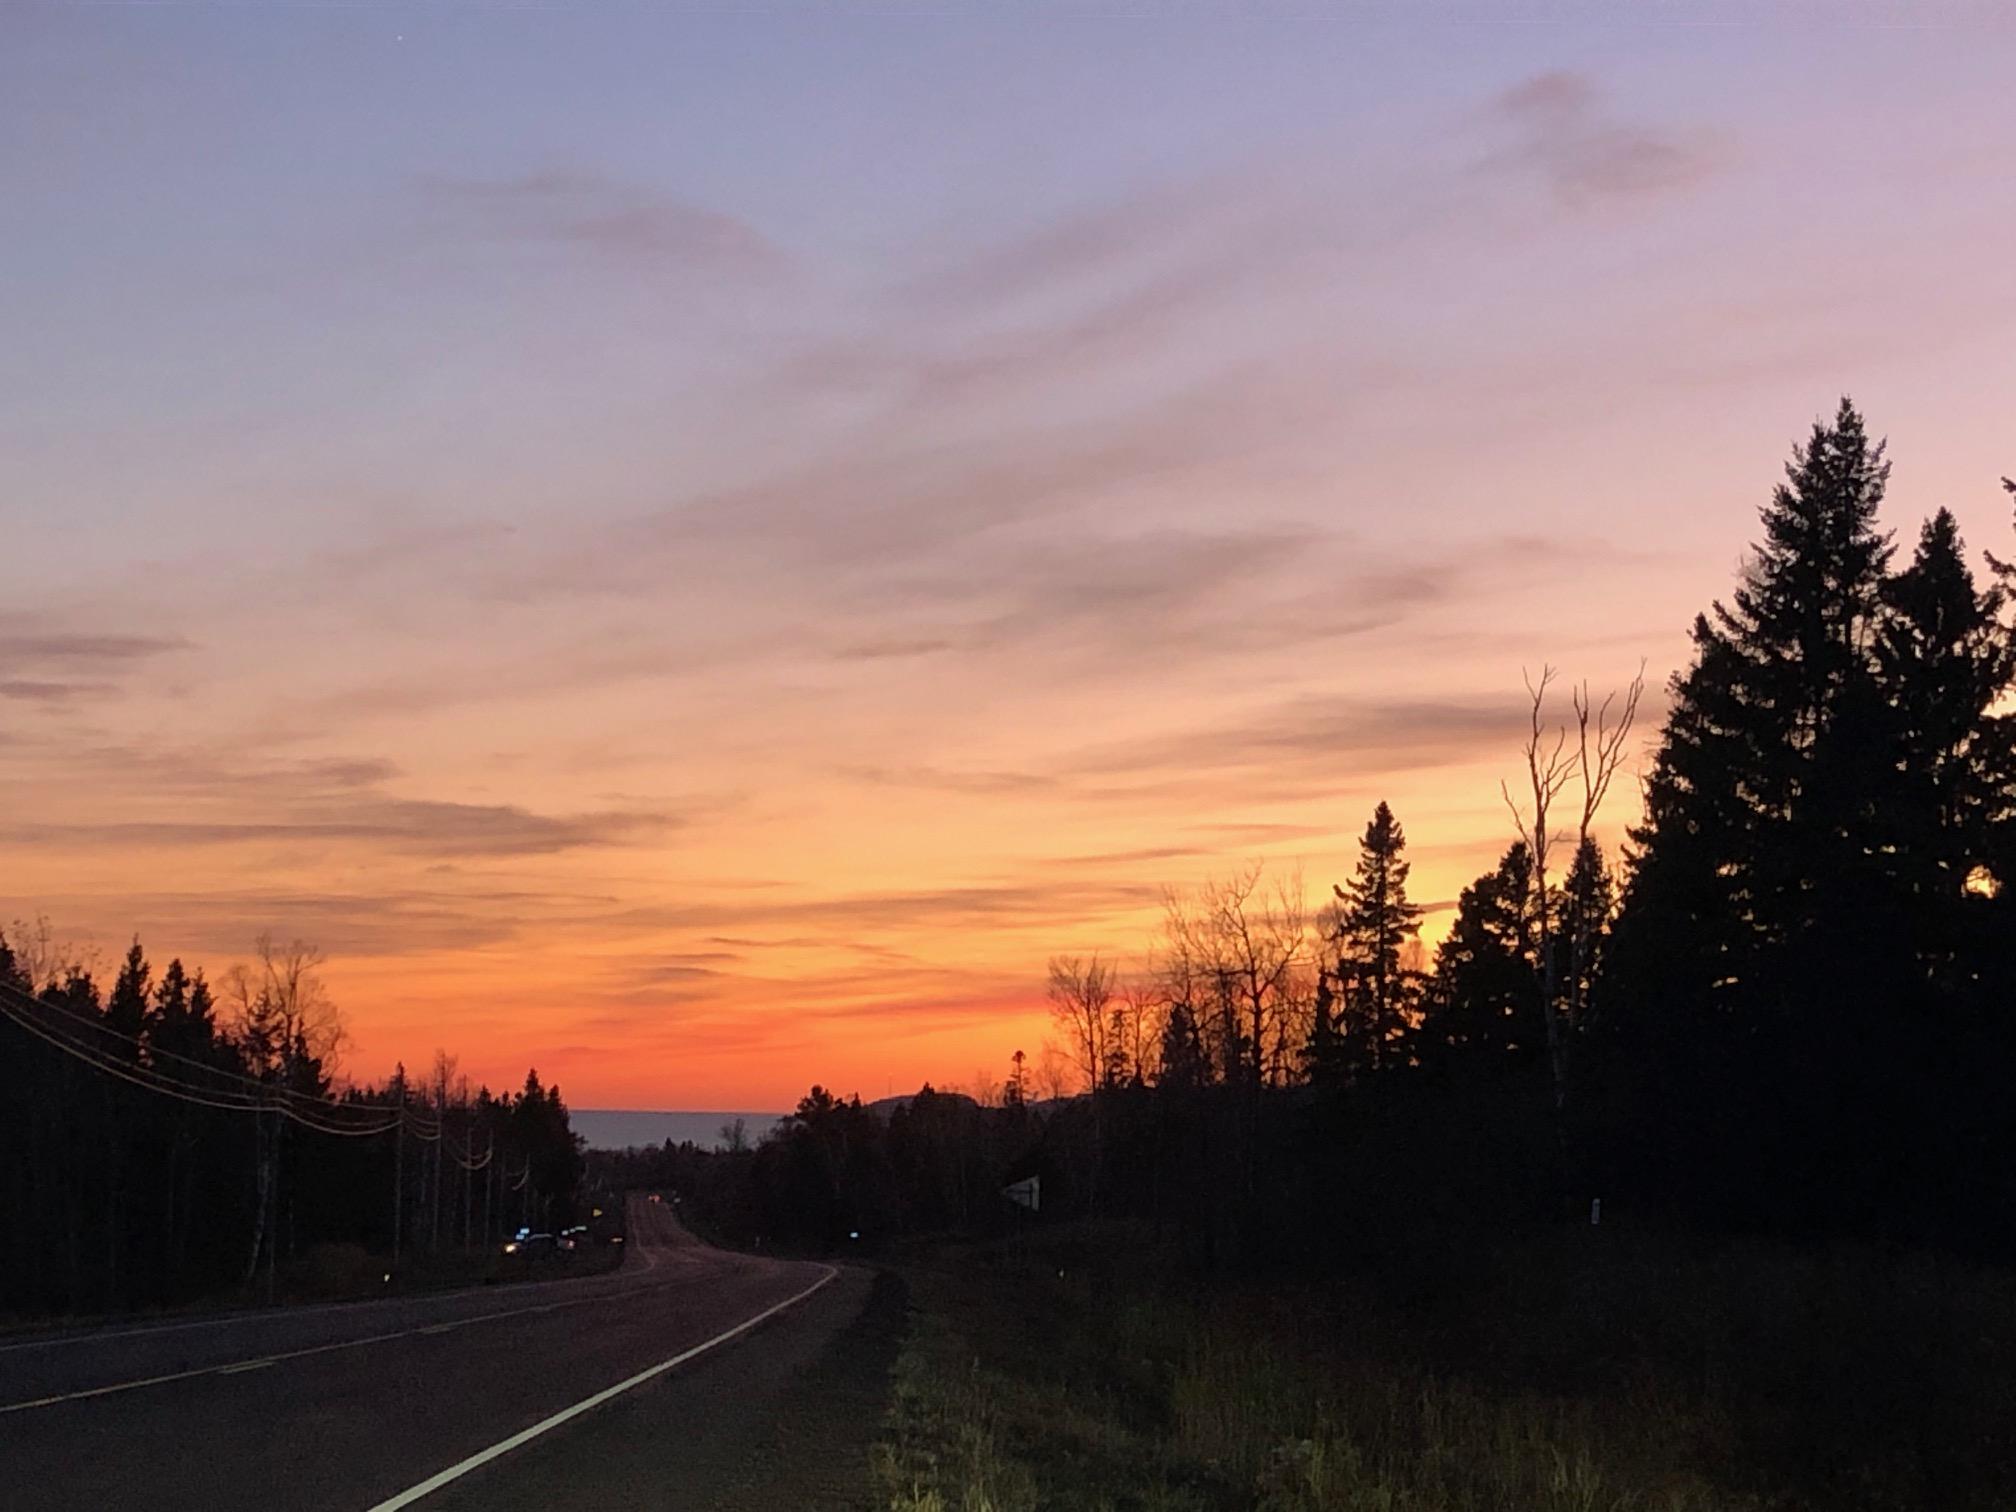 Silver Bay at sunset